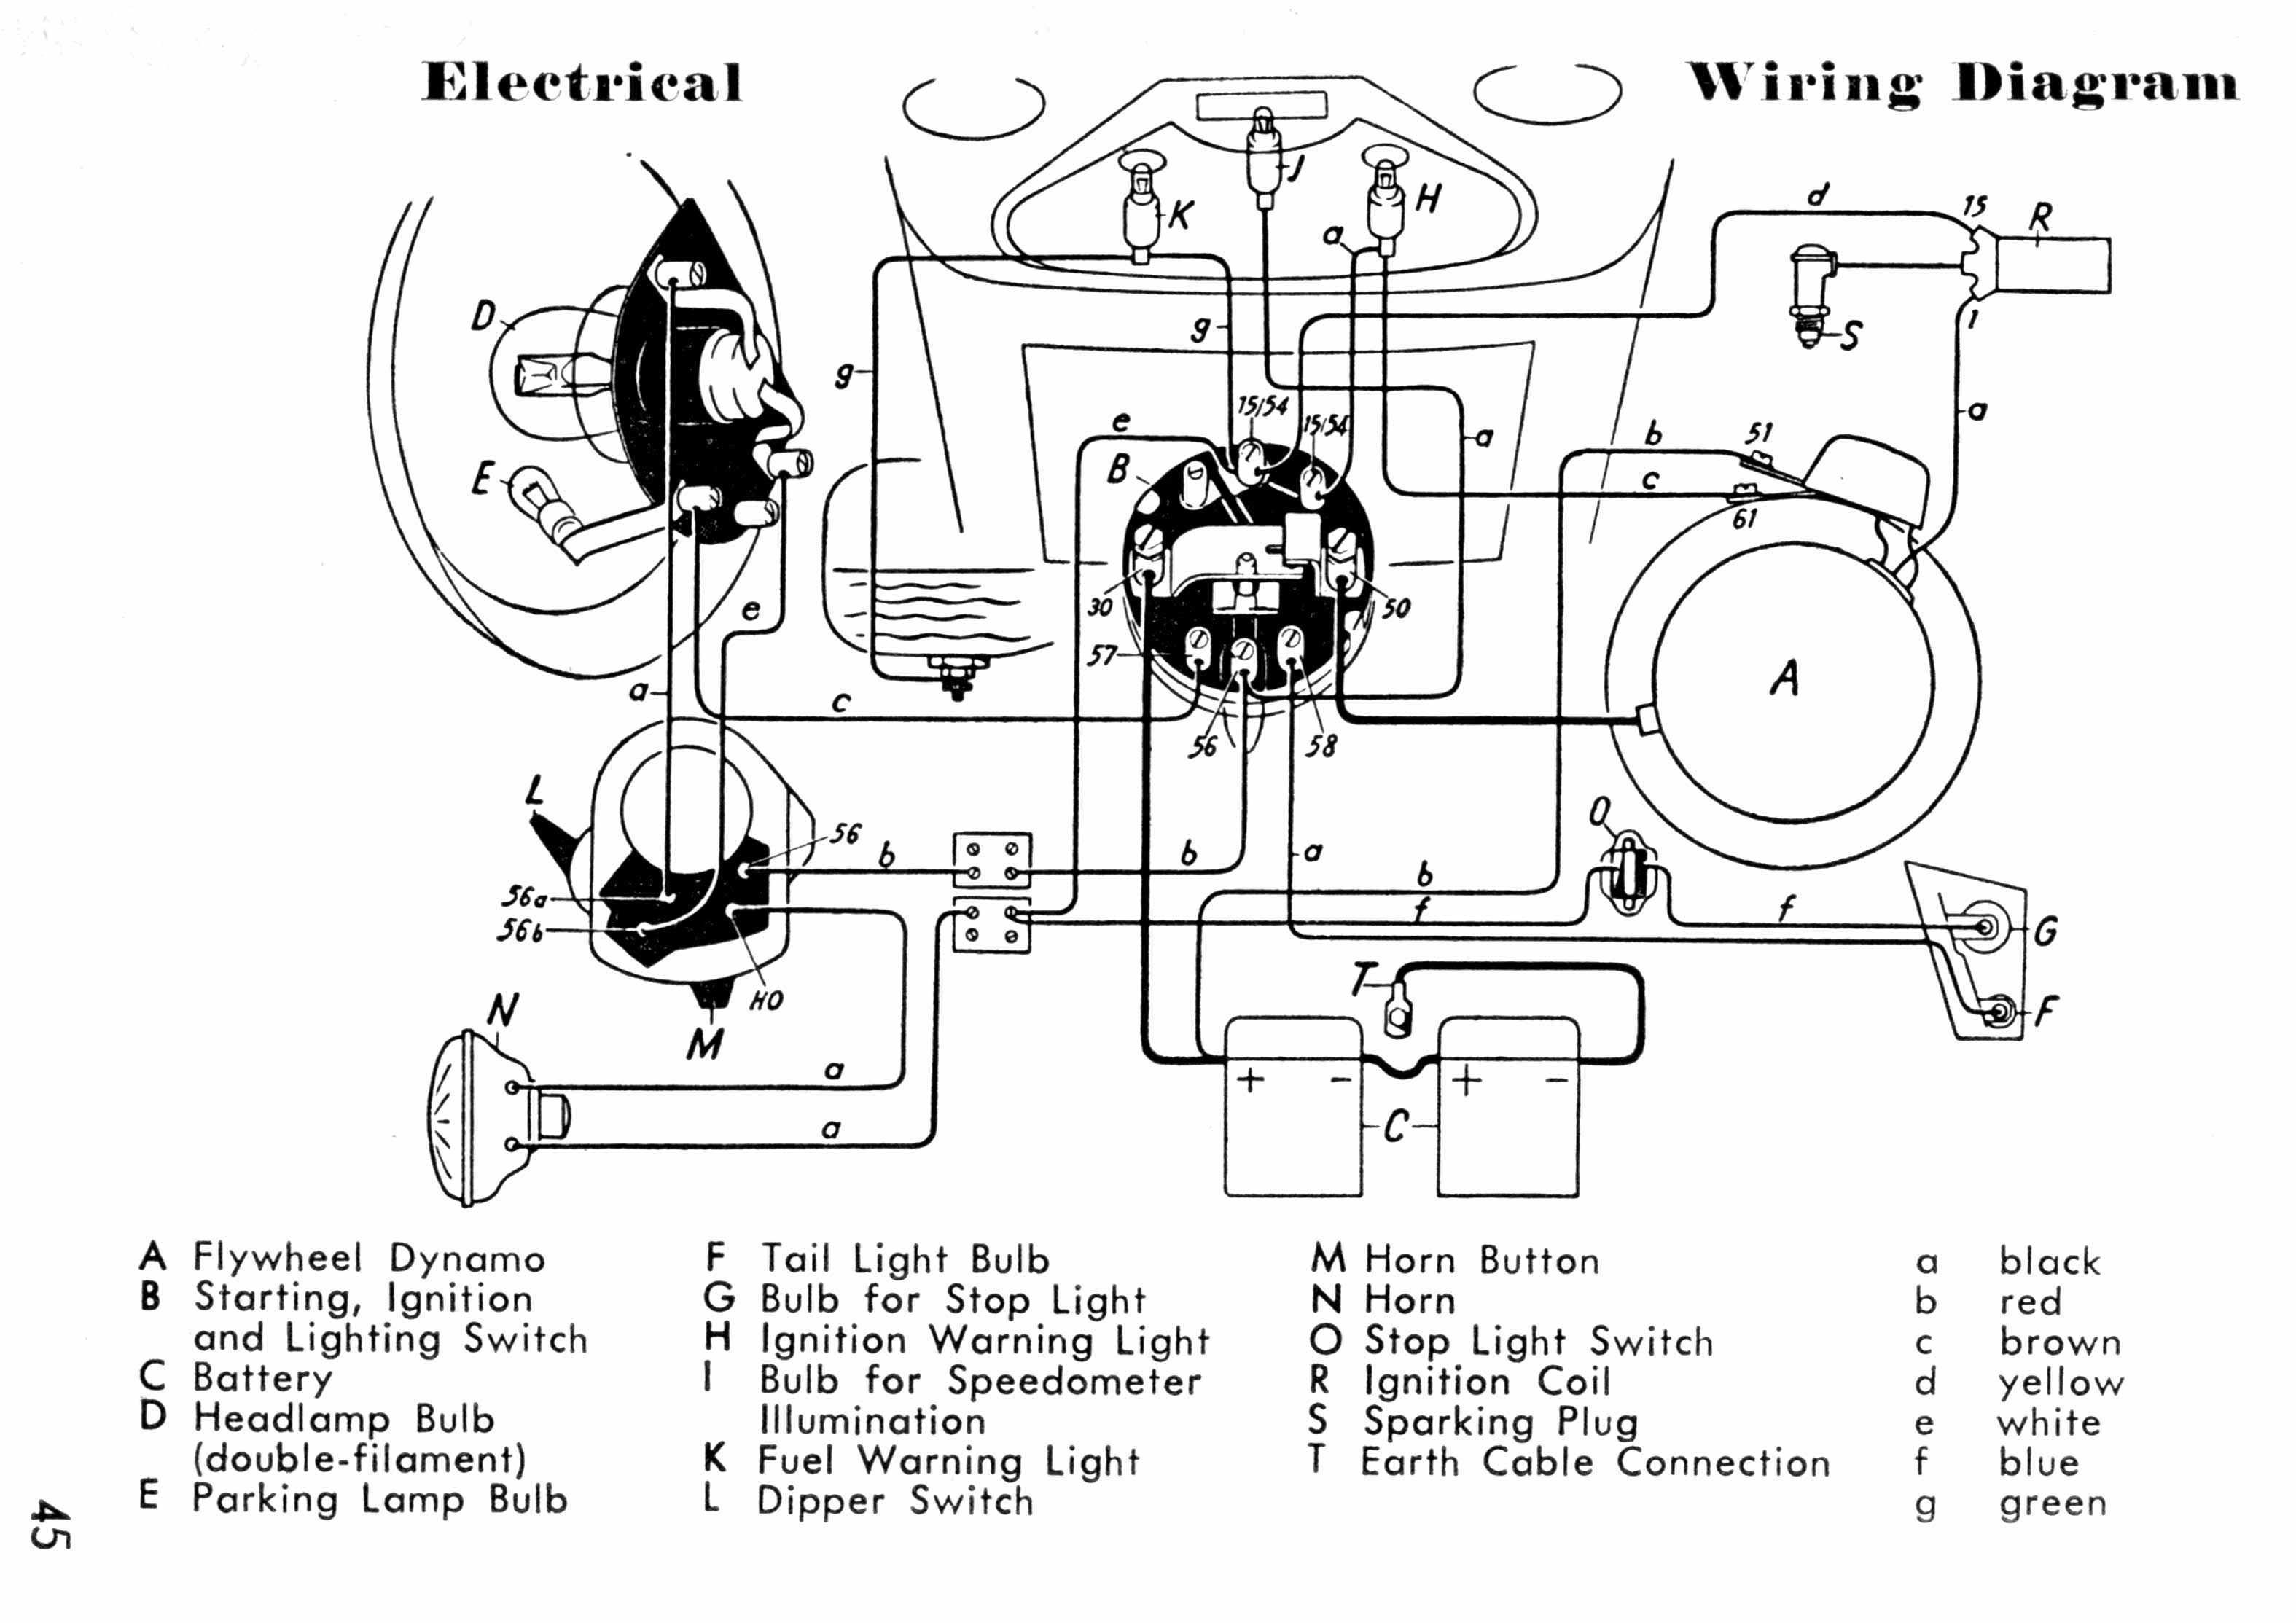 Taotao 49cc Scooter Wiring Diagram 3w Led Driver Circuit Pulg 50cc Wire Data Schematic Electric Closet Pinterest Roketa